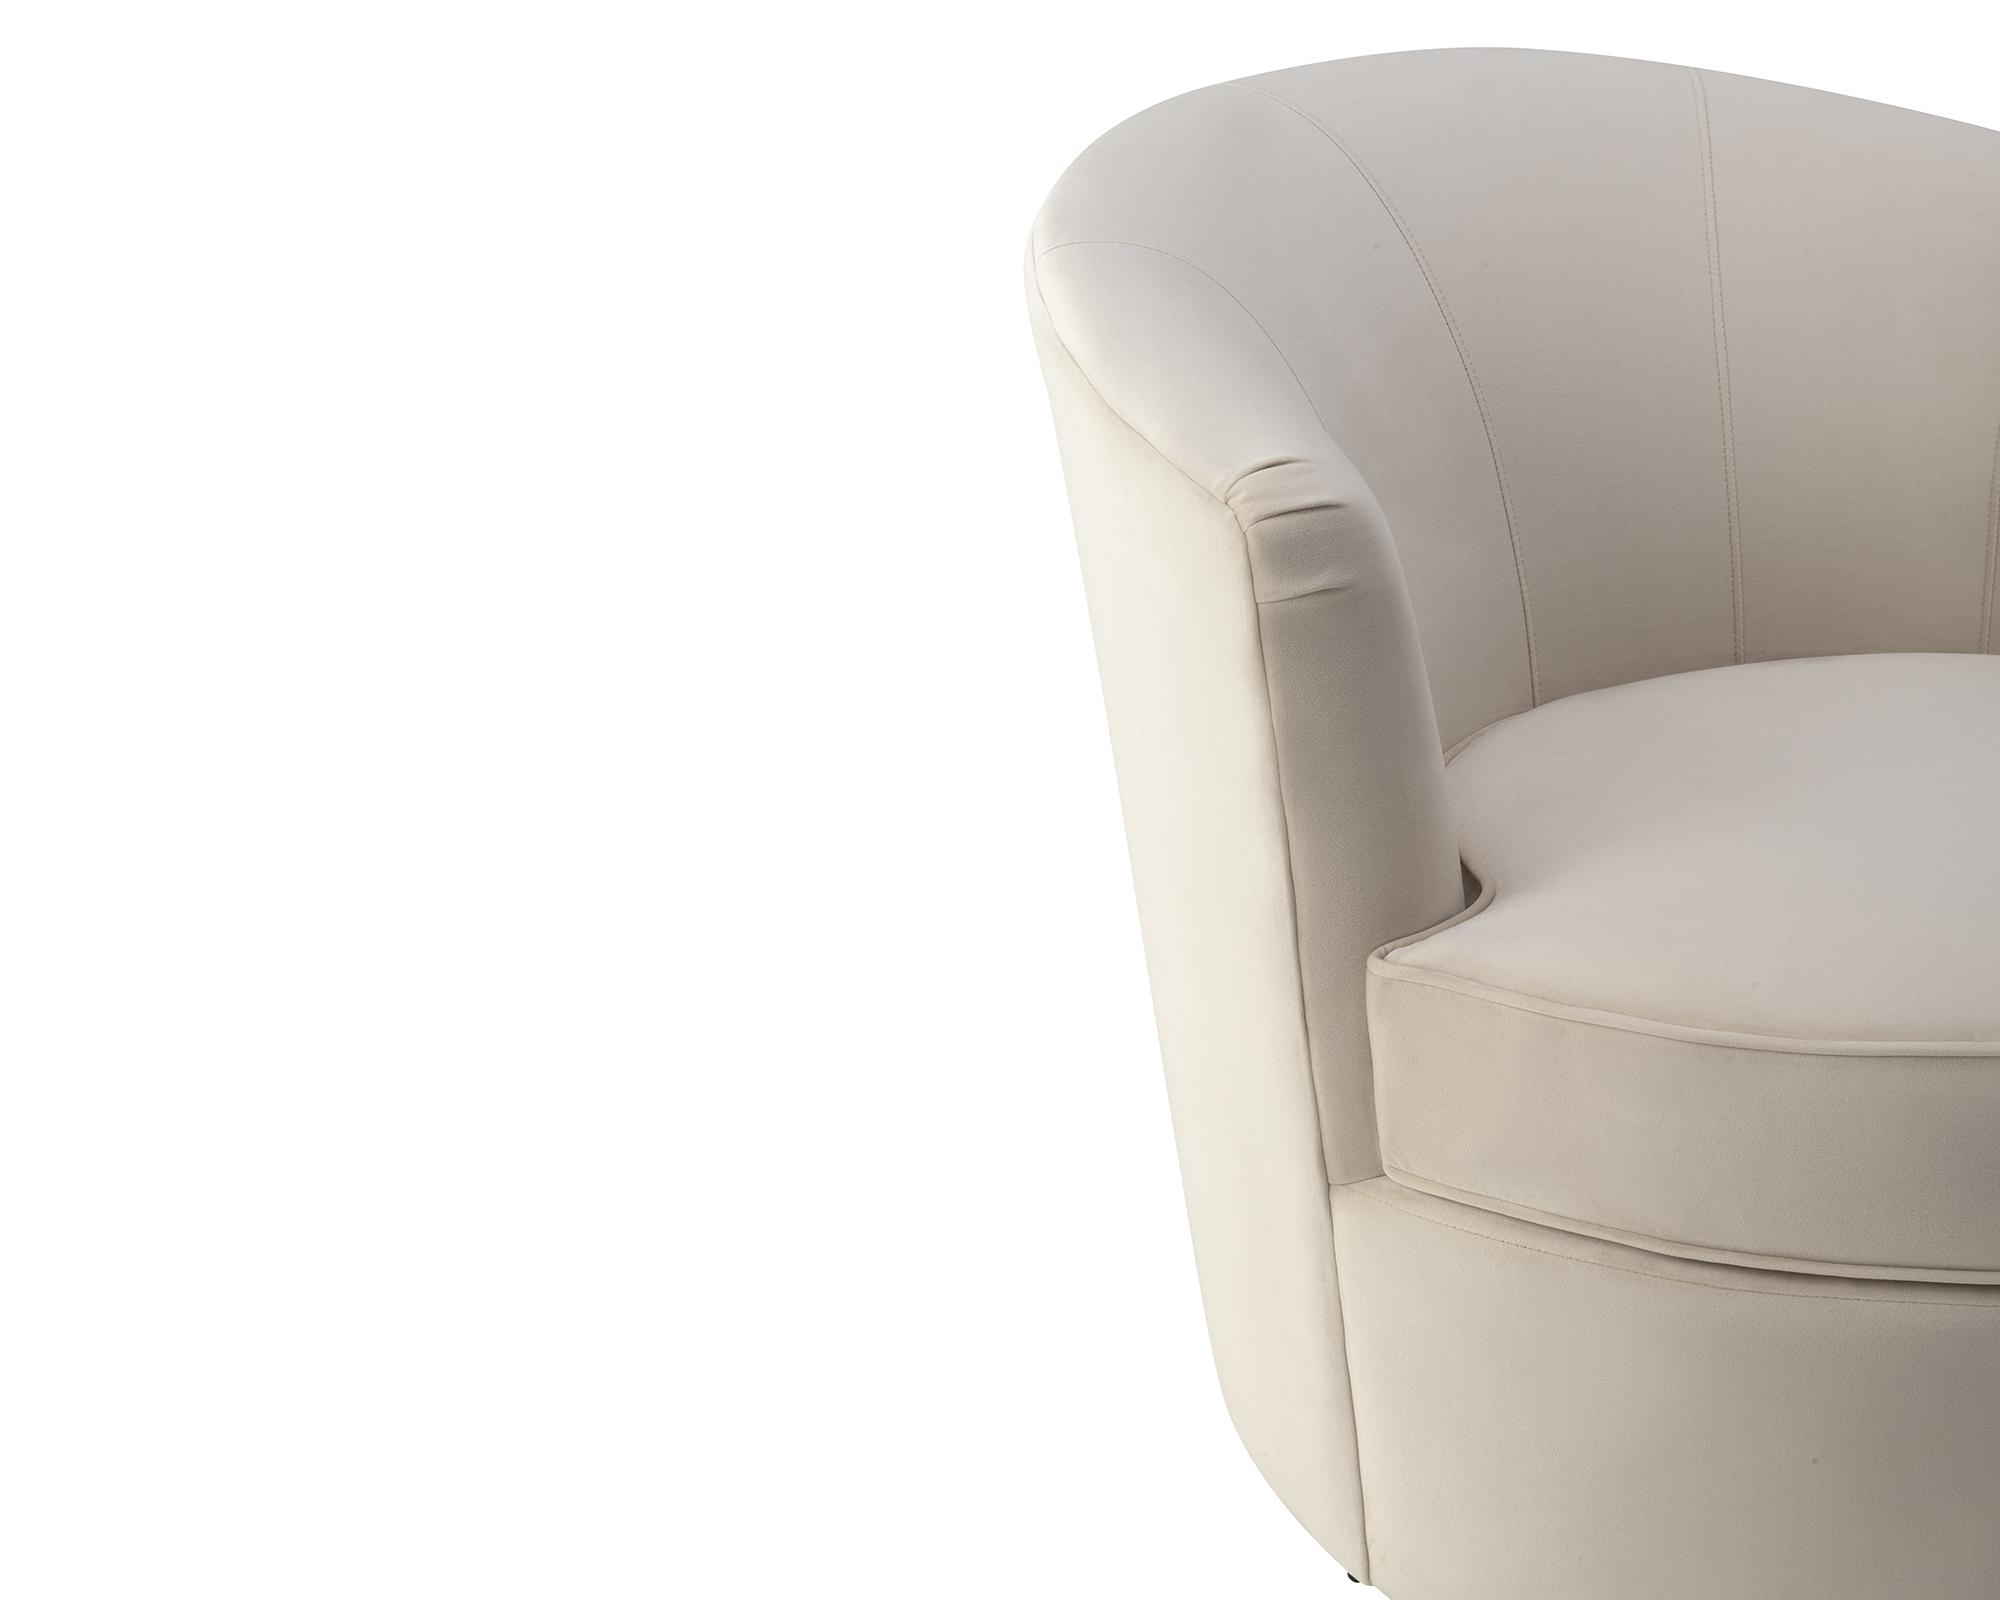 Liang & Eimil Kiss Occasional Chair Tan Beige Velvet BH-OCH-084 (5)